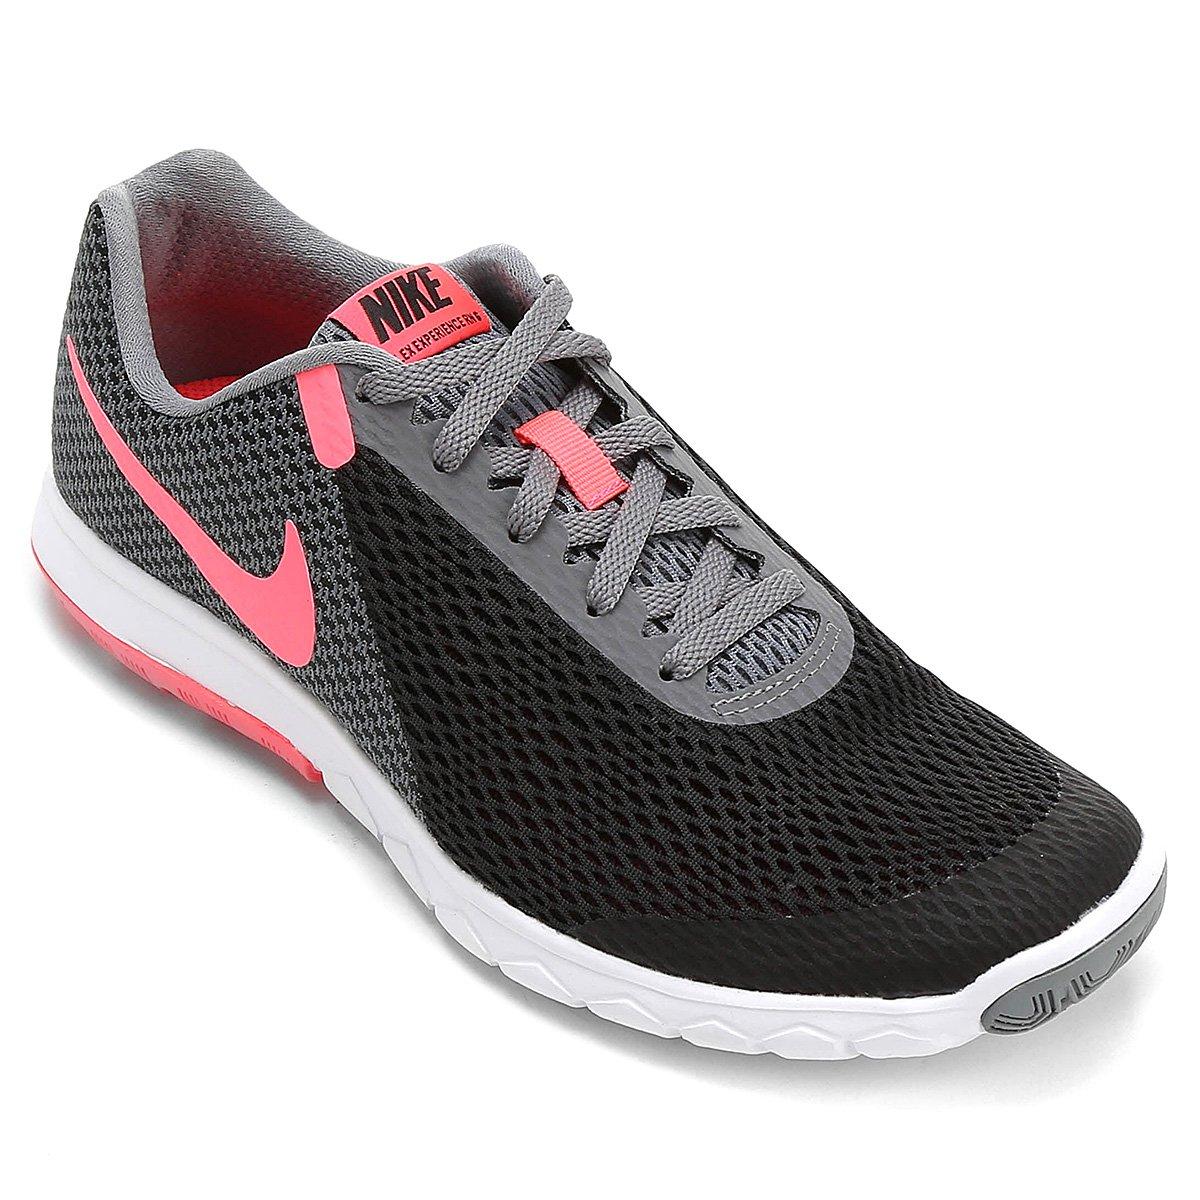 1b69c9b58569f Tênis Nike Flex Experience Rn 6 Feminino. undefined